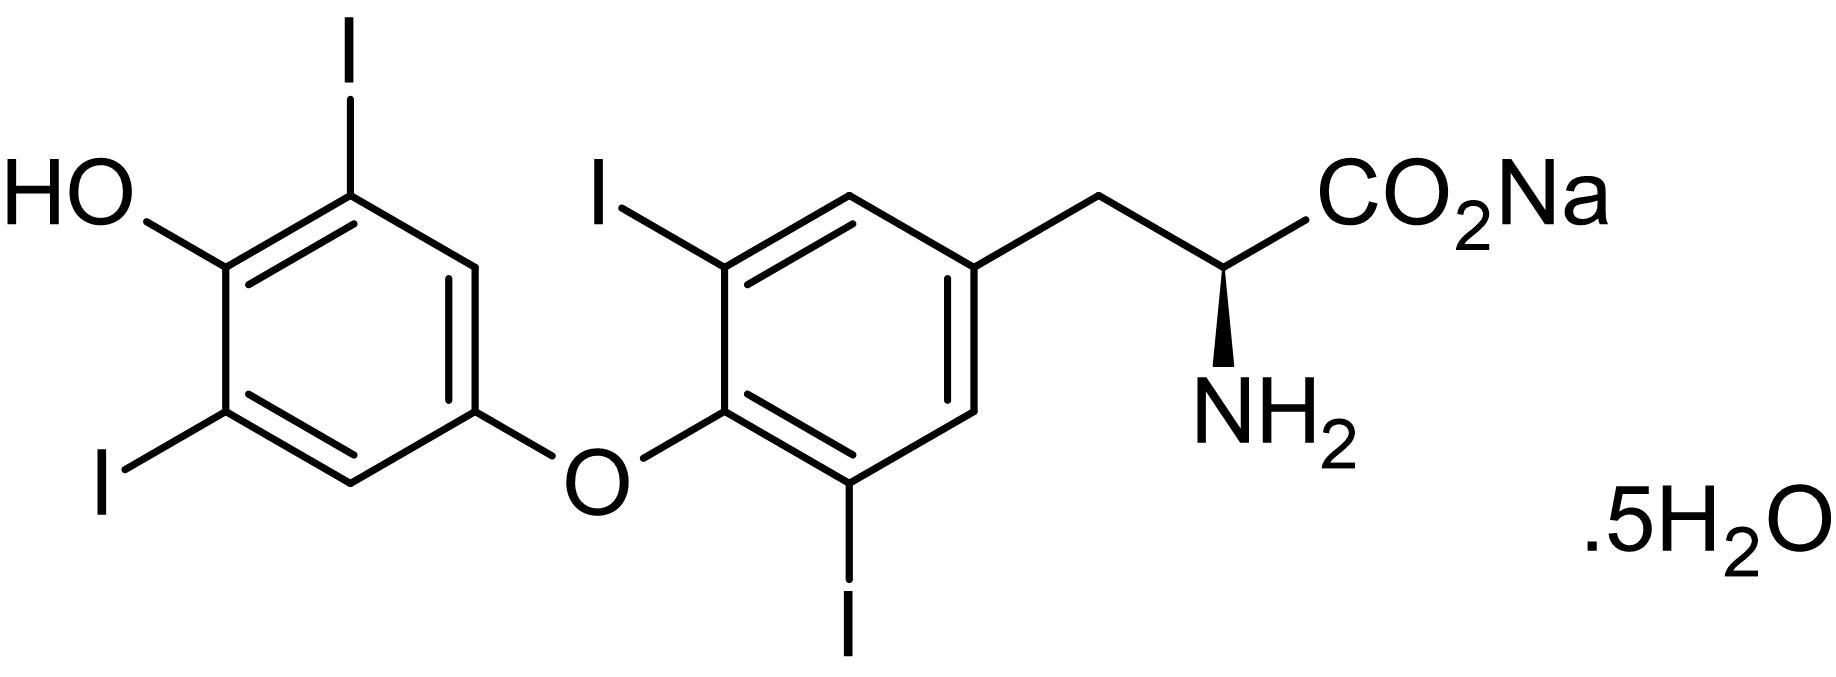 Chemical Structure - L-Thyroxine sodium salt pentahydrate (Sodium levothyroxine), thyroid prohormone (T<sub>4</sub>) (ab143720)